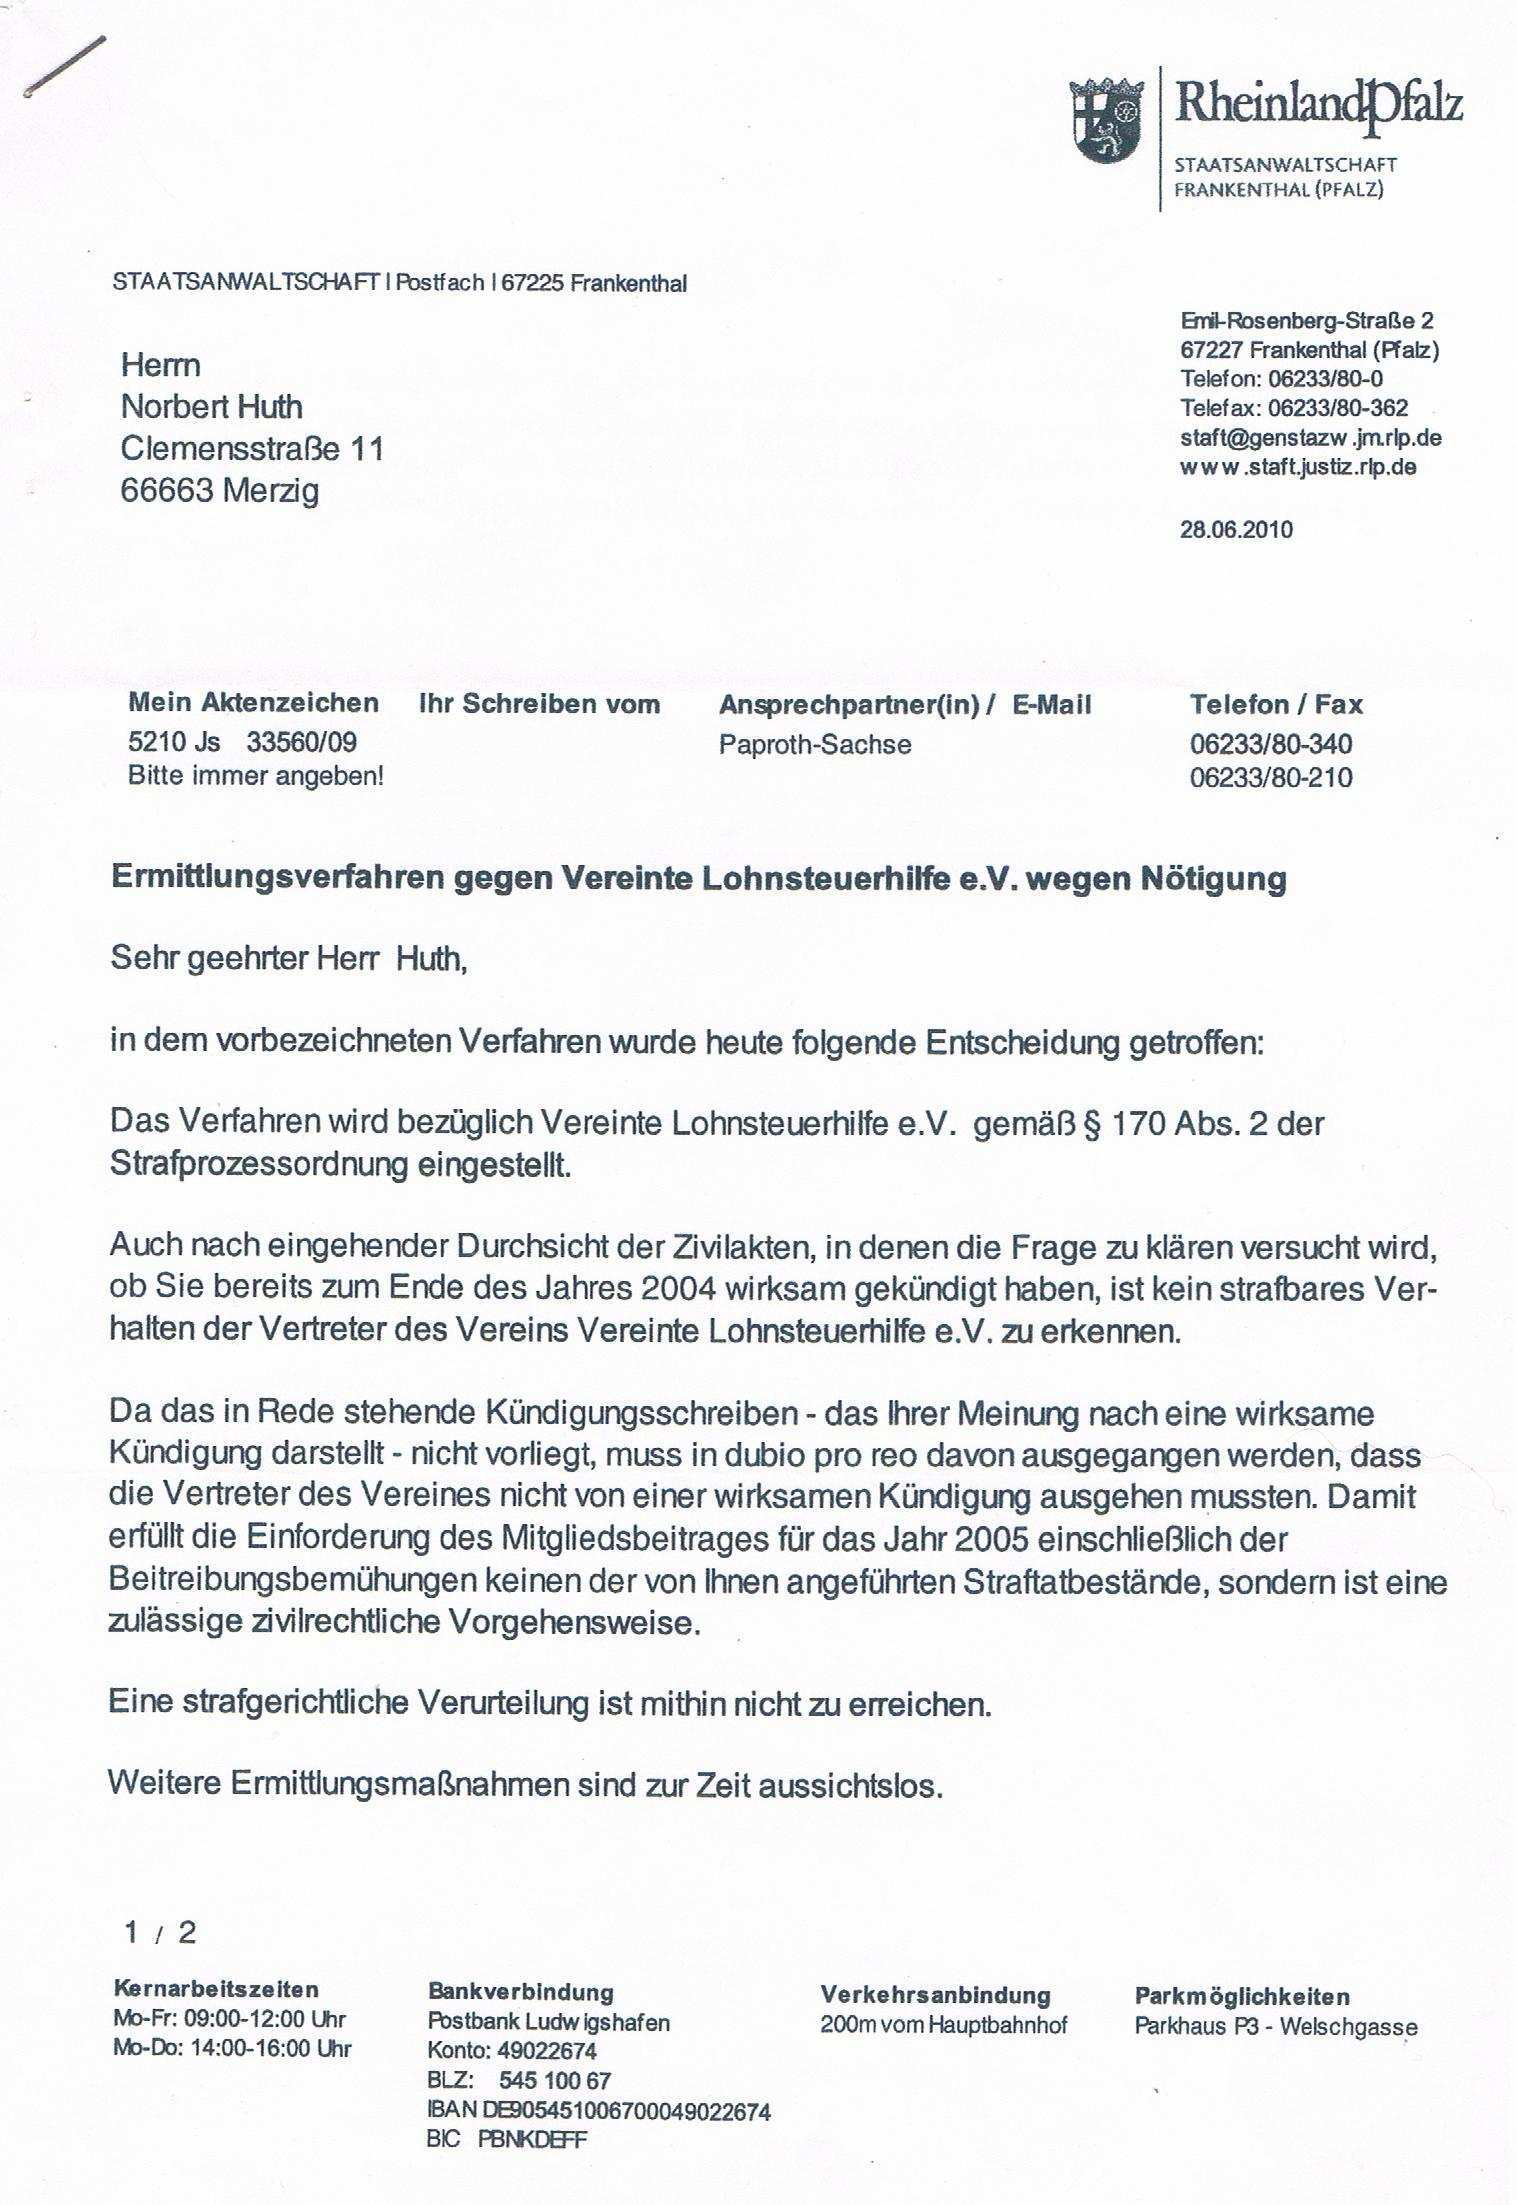 Offener Brief An Minister Der Justiz Zeitnah Burgerreport